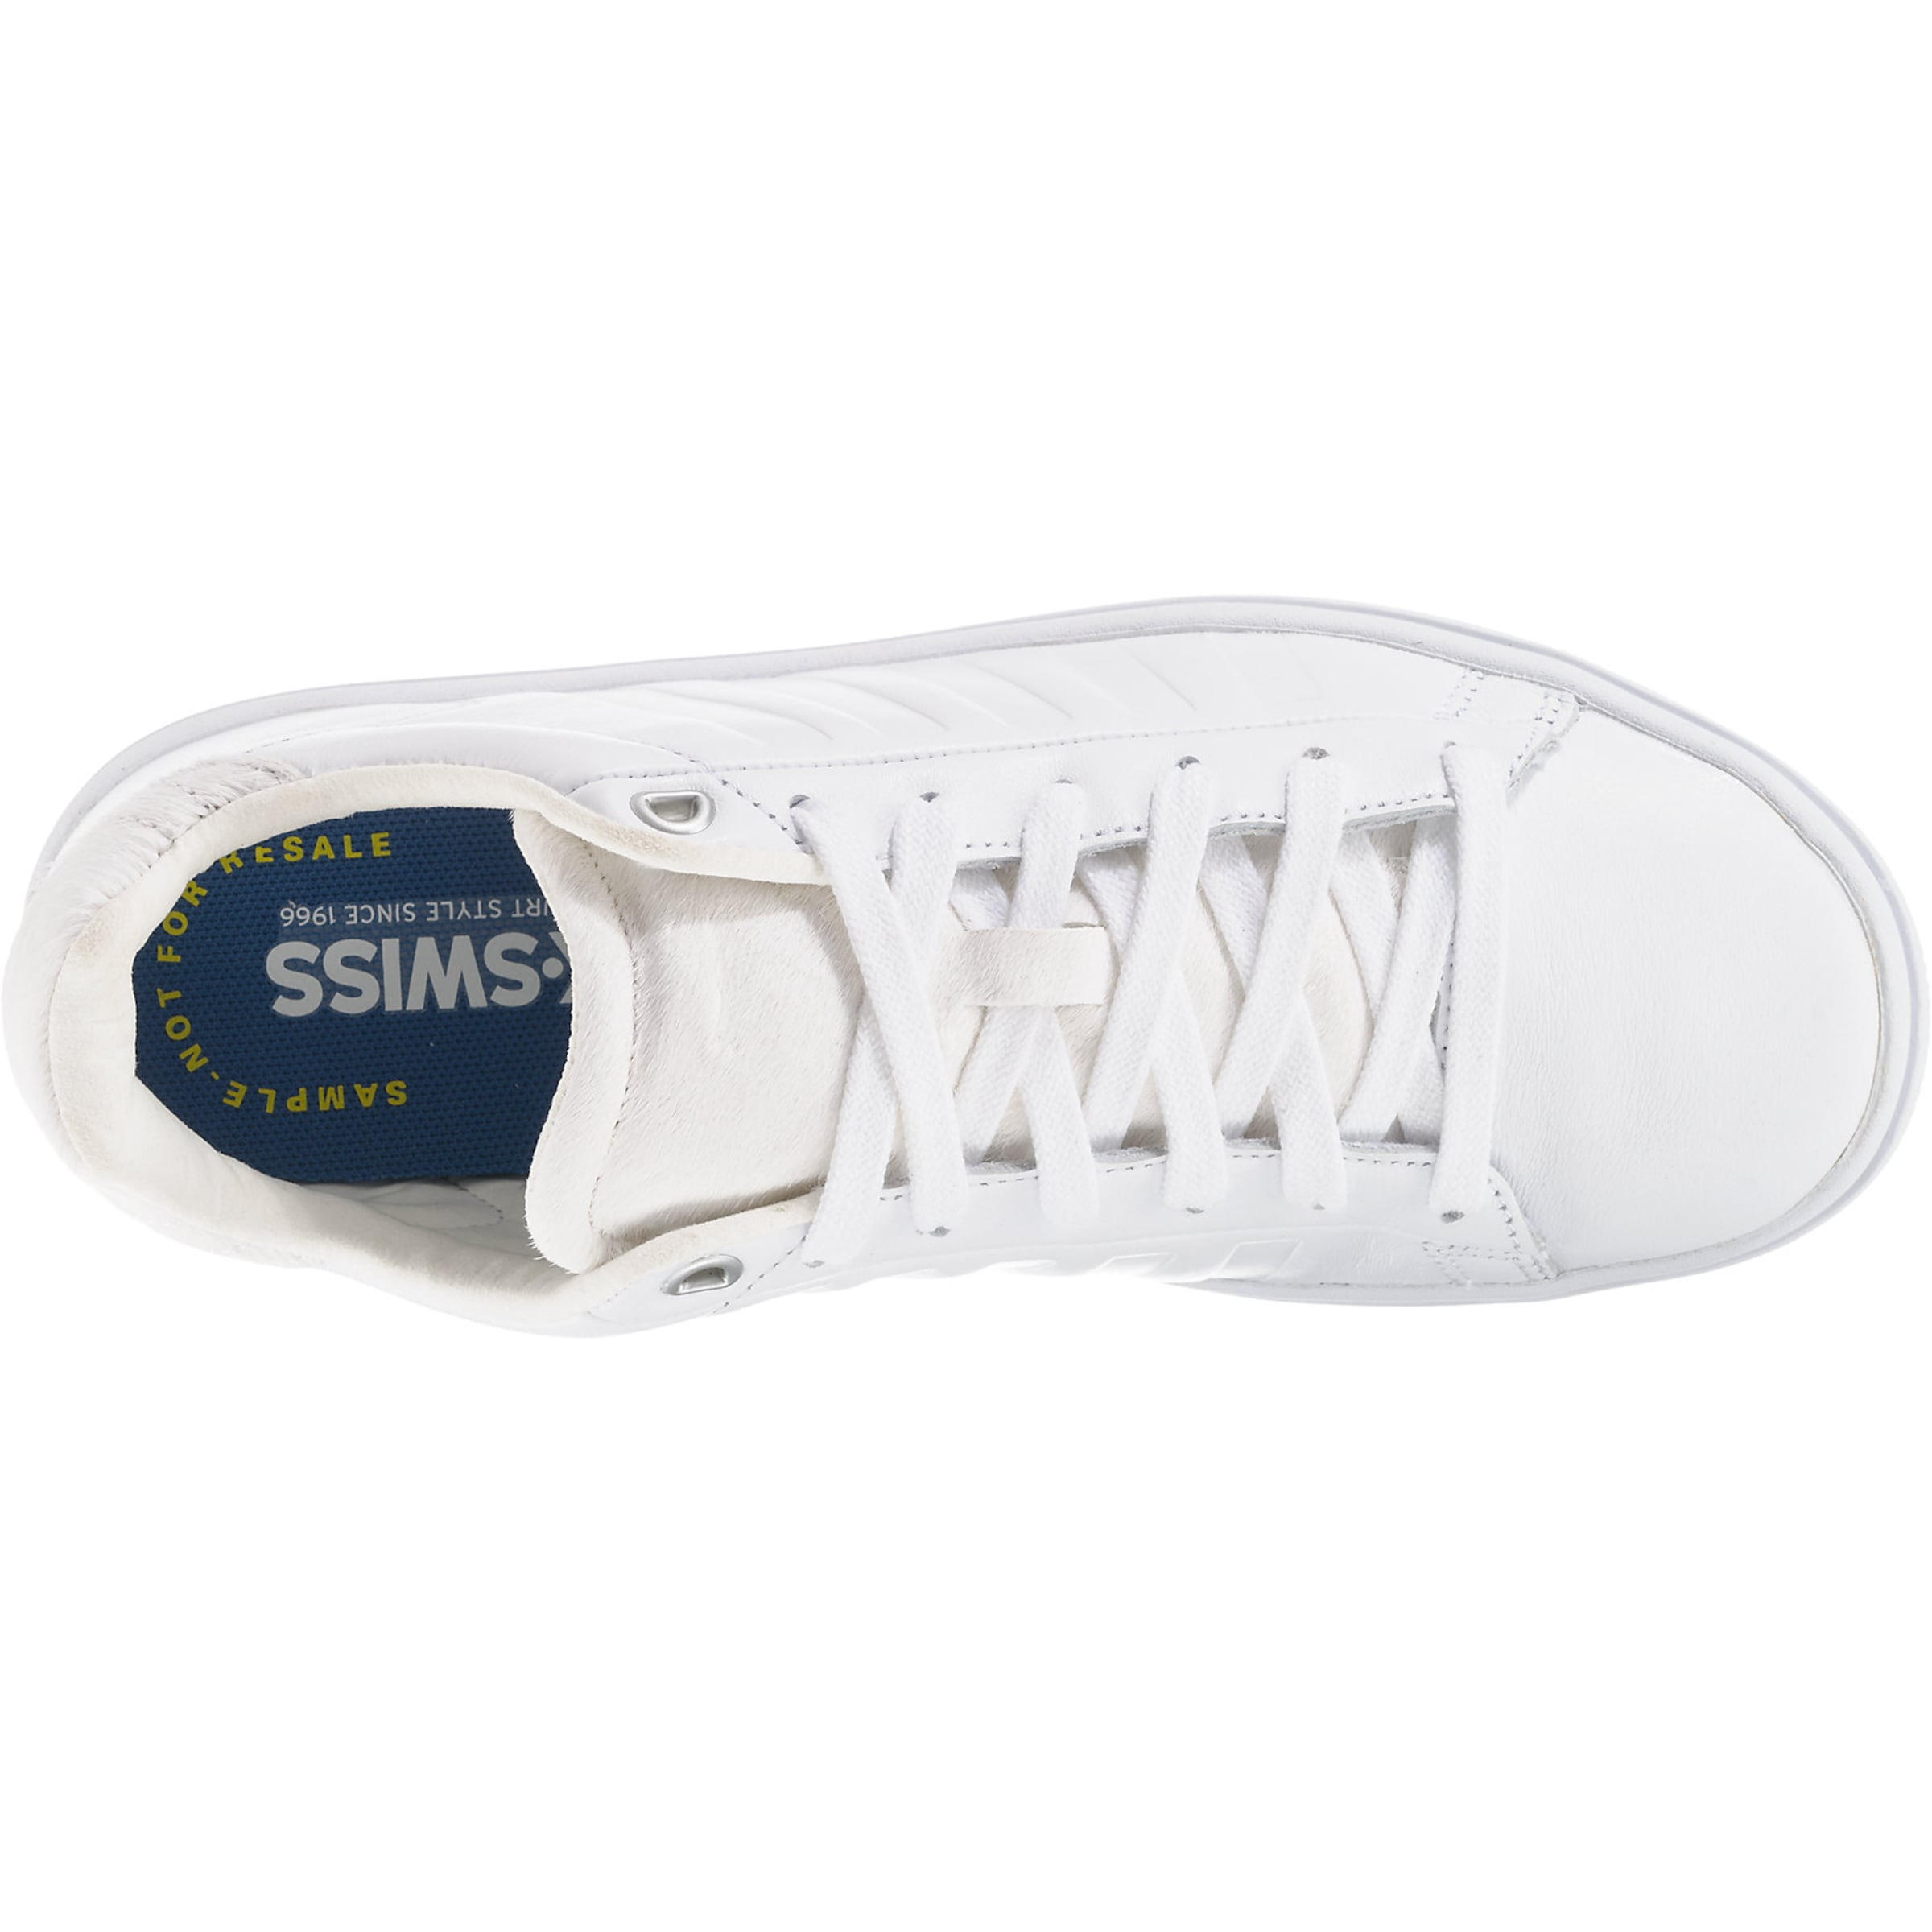 In Weiß K Sneakers swiss Low 'court Frasco' XikZuPwTOl